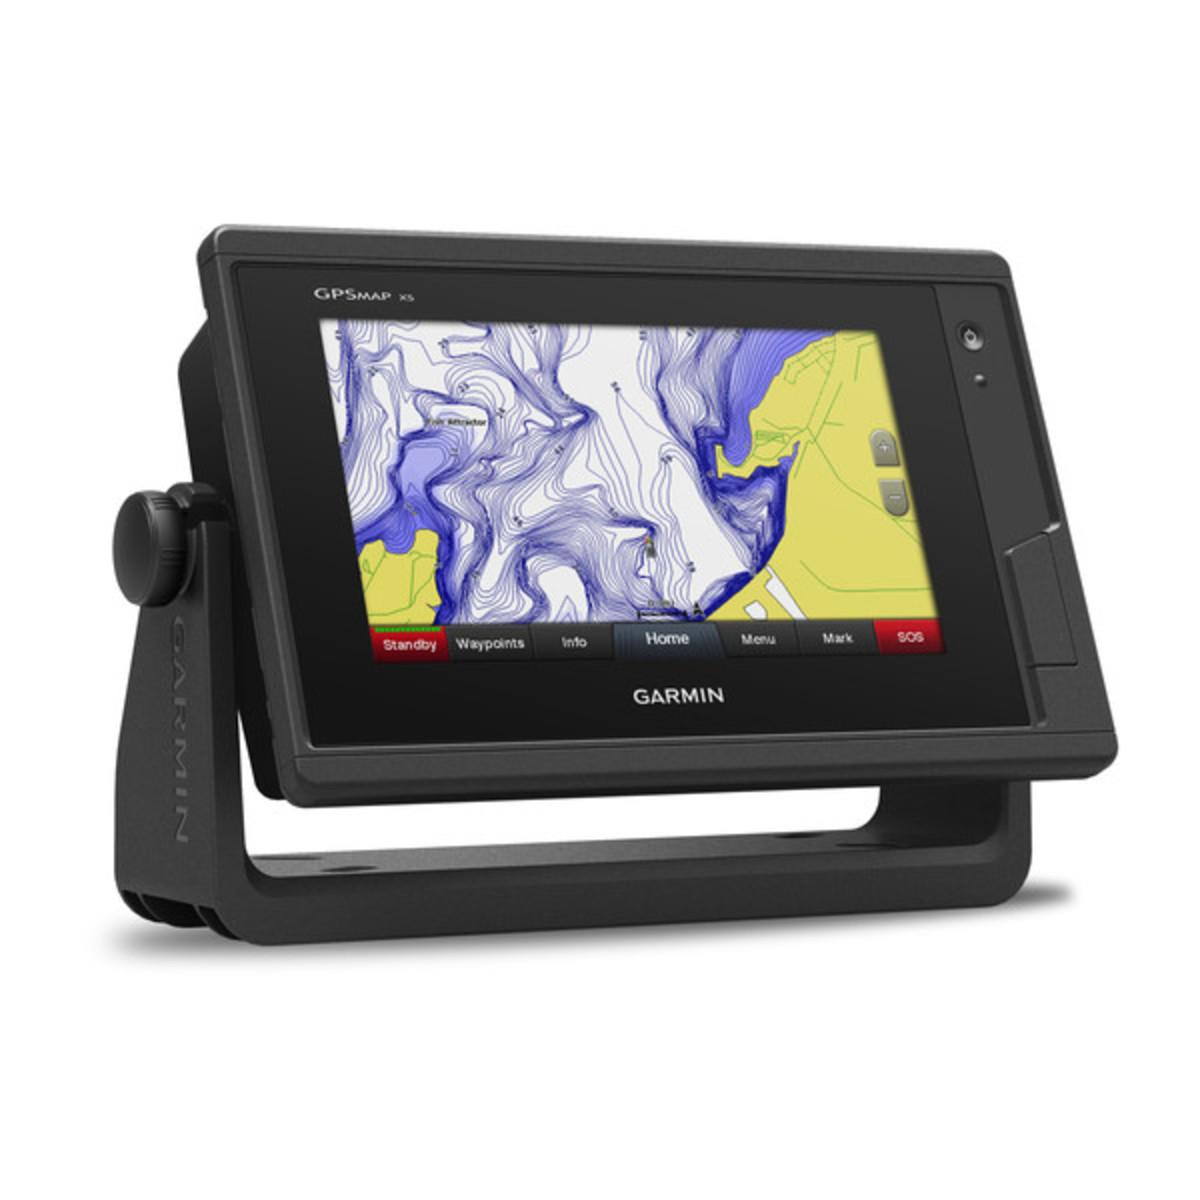 Garmin GPSMAP 742xs